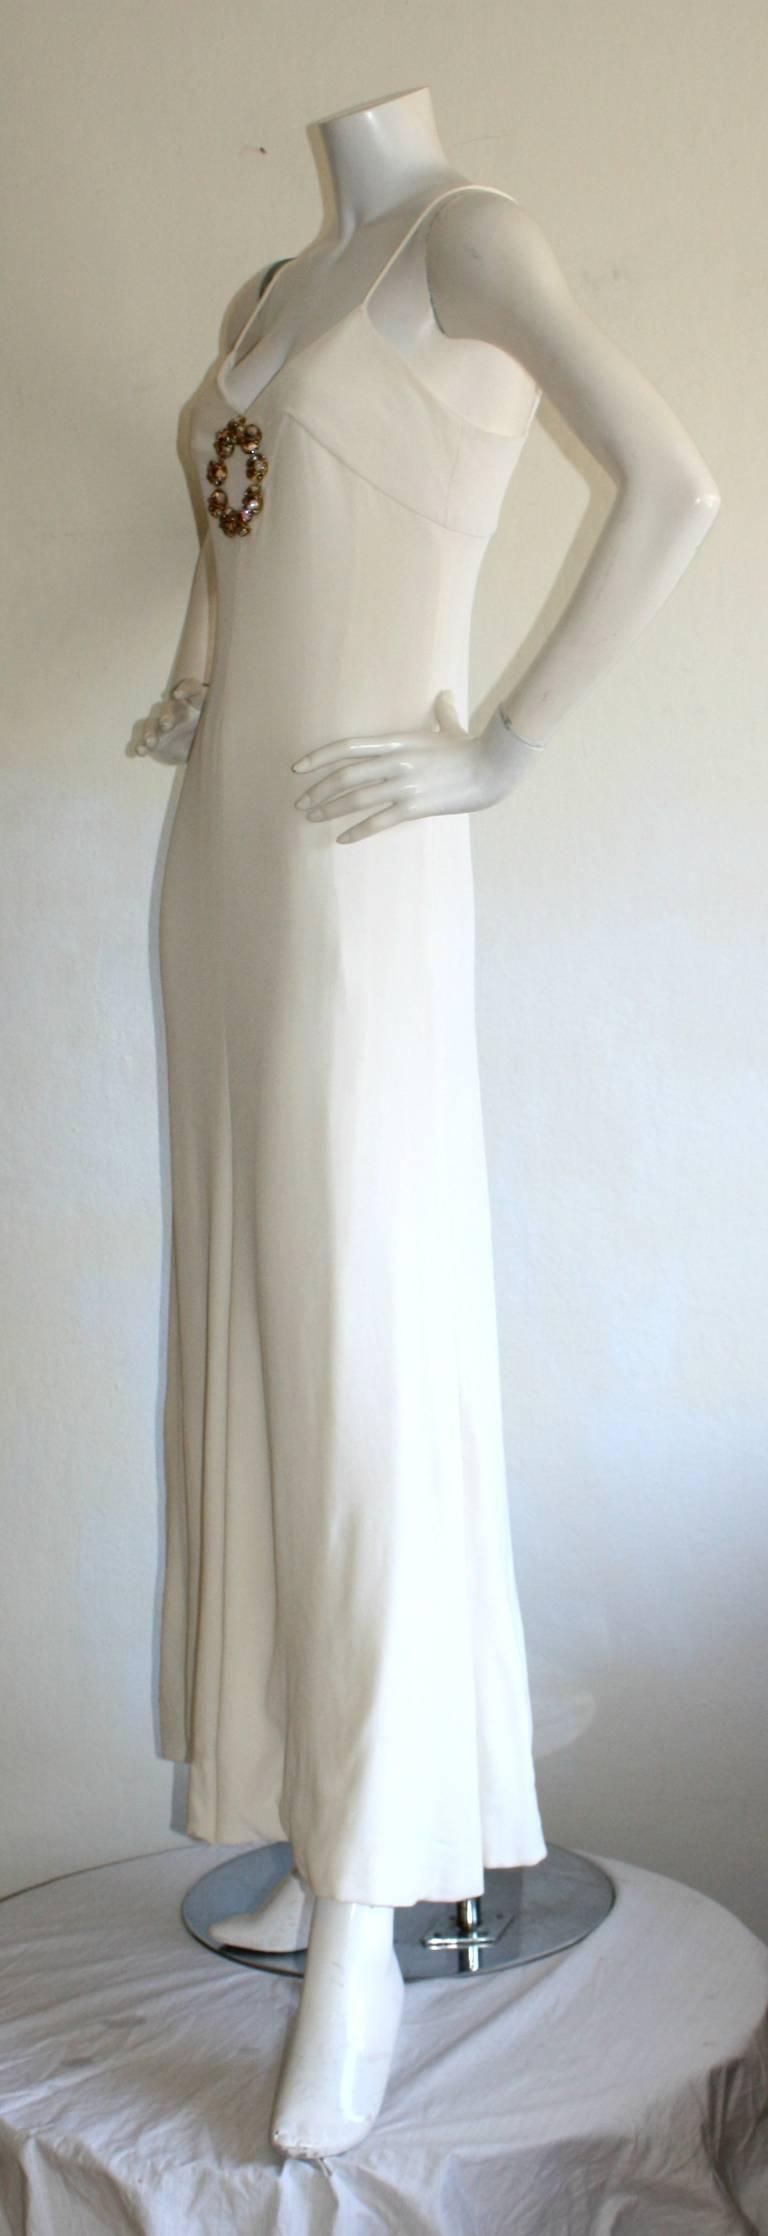 Beautiful 1970s Vintage Oscar de la Renta White Jewel Gown Perfect Wedding Dress 6